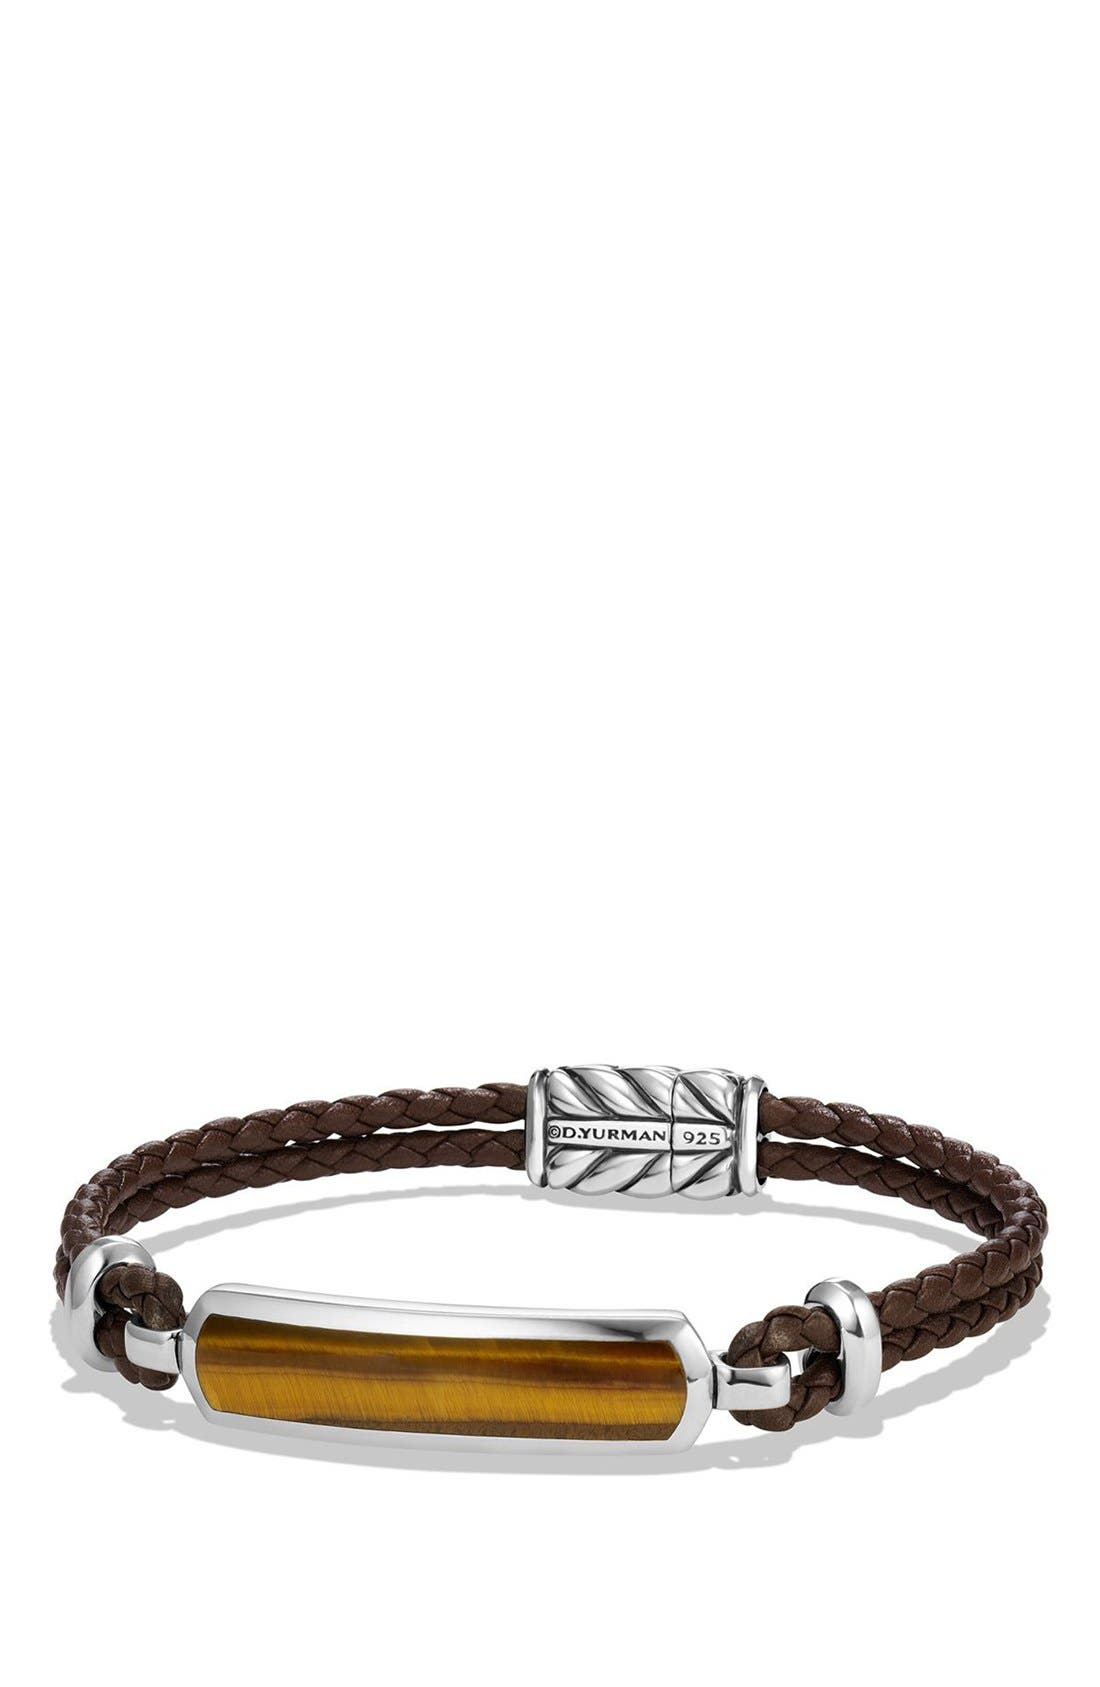 Main Image - David Yurman Bar Station Leather Bracelet